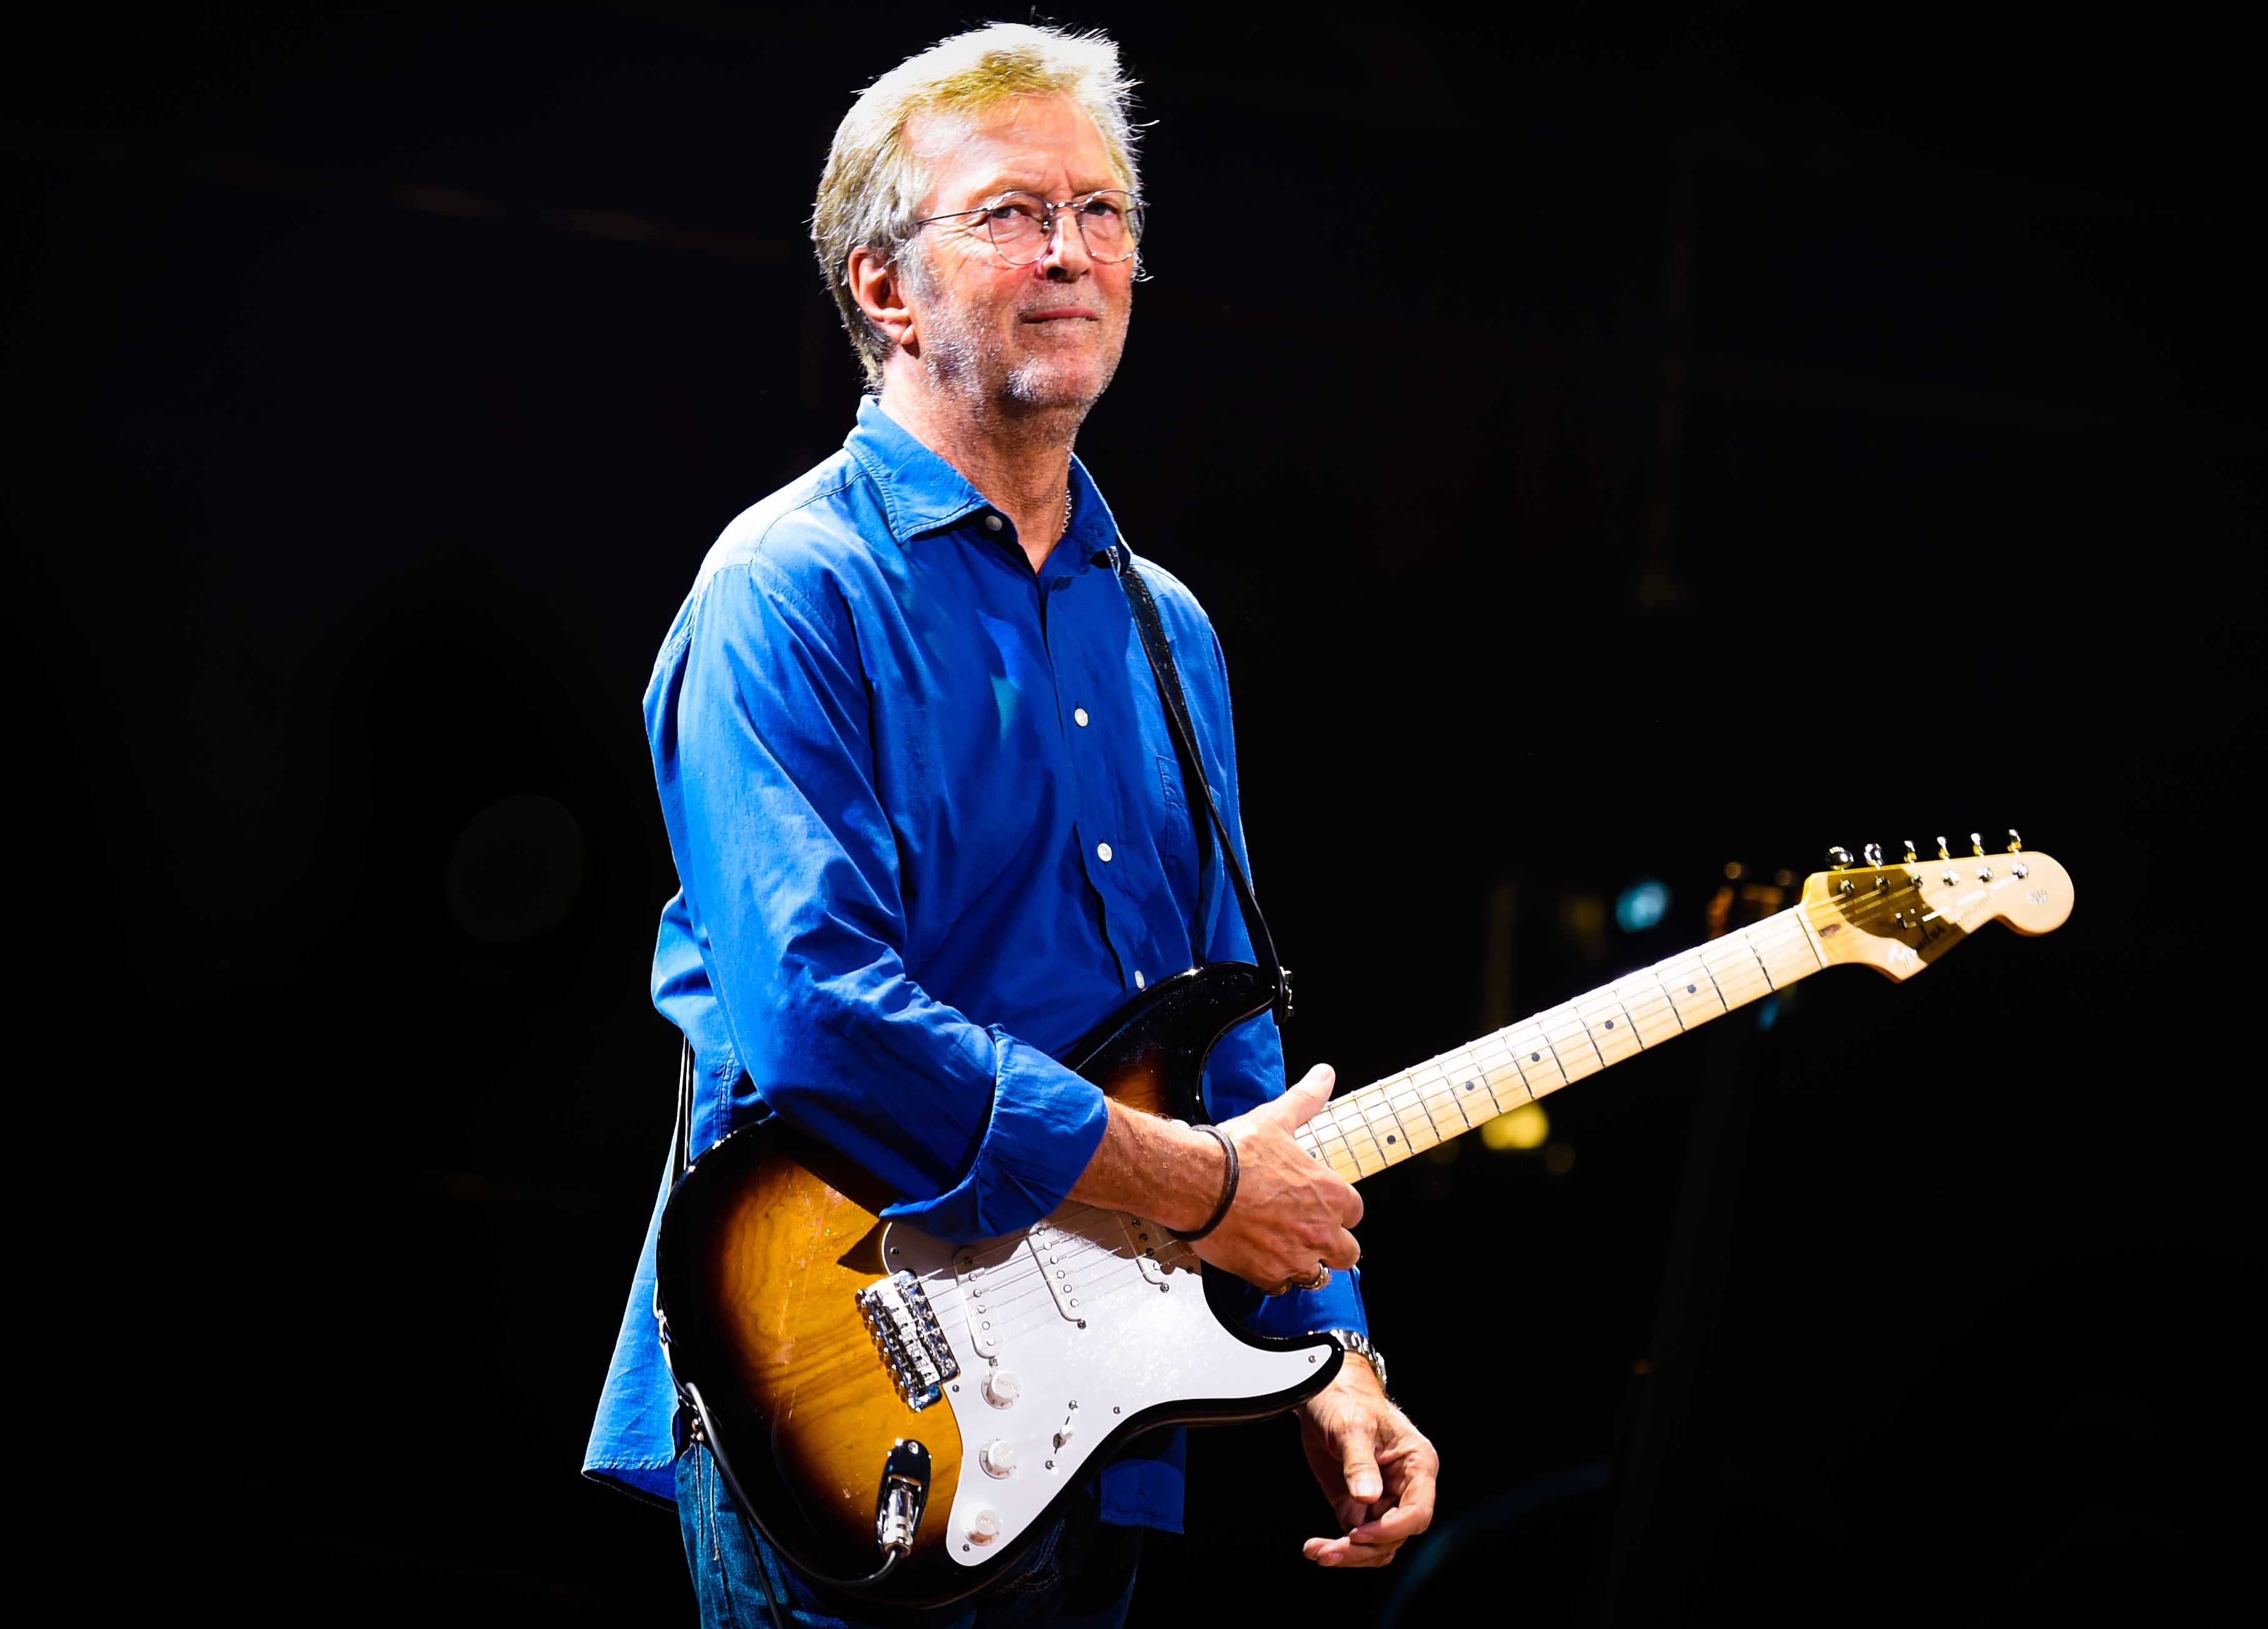 Eric Clapton Announces New 2021 U.S. Concert Dates – Tickets Available!